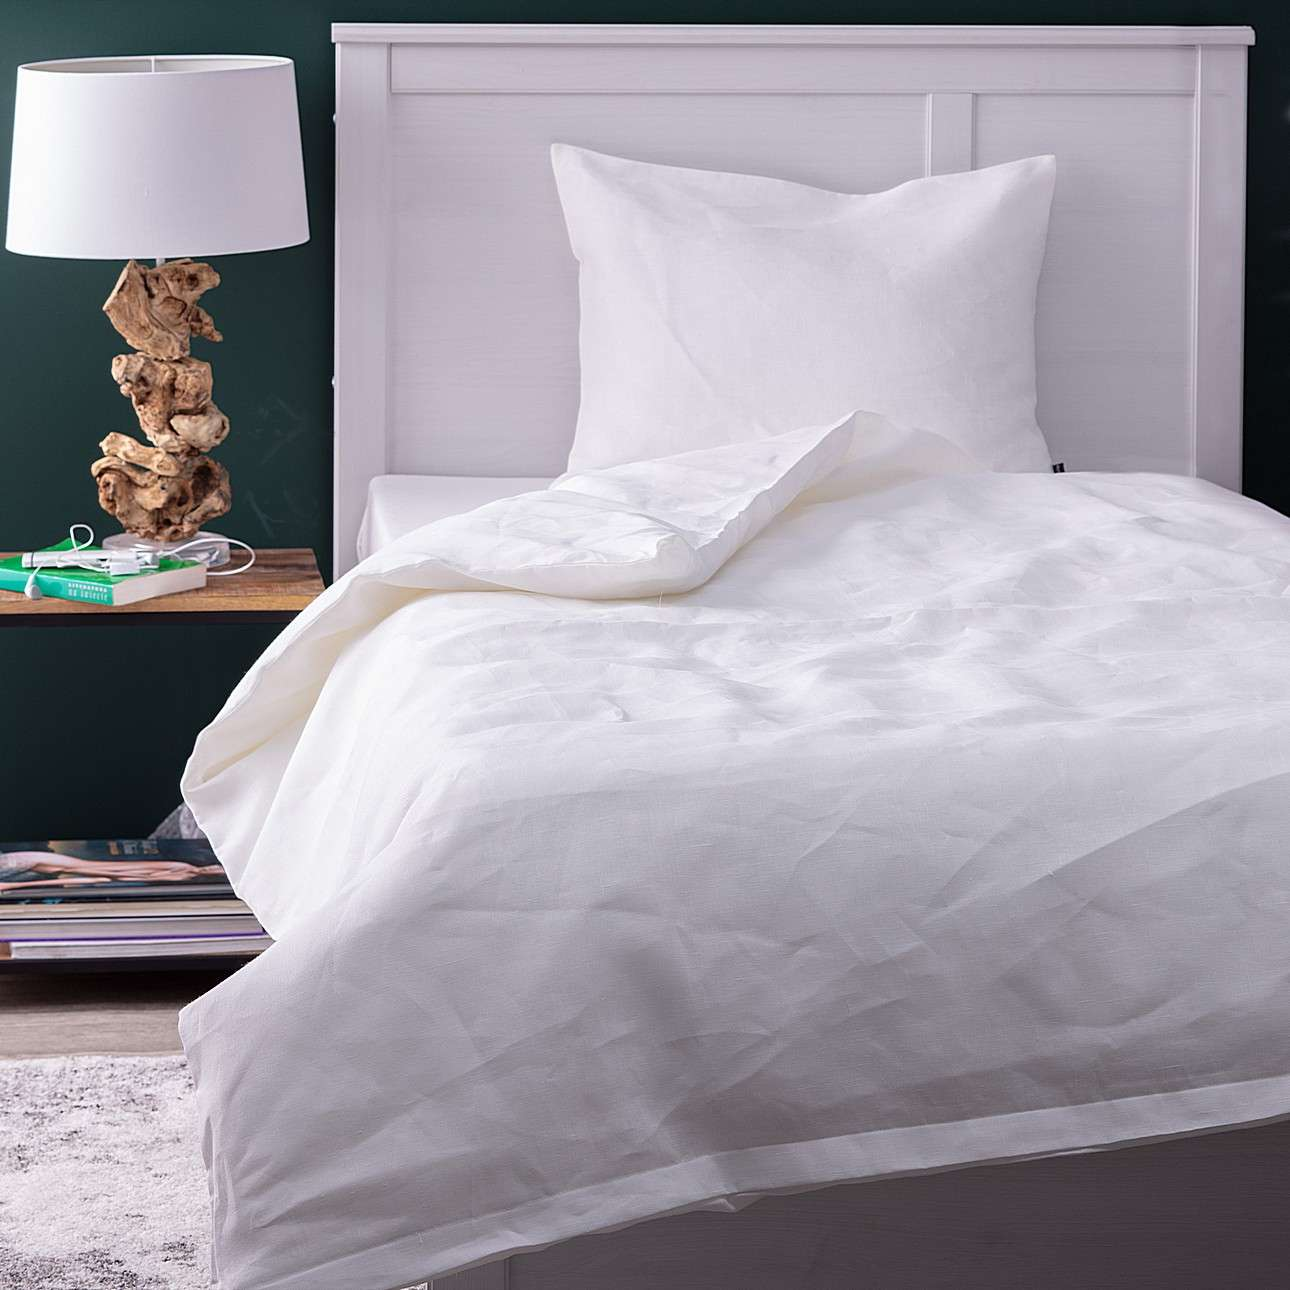 Komplet pościeli lnianej Linen 150x200cm white